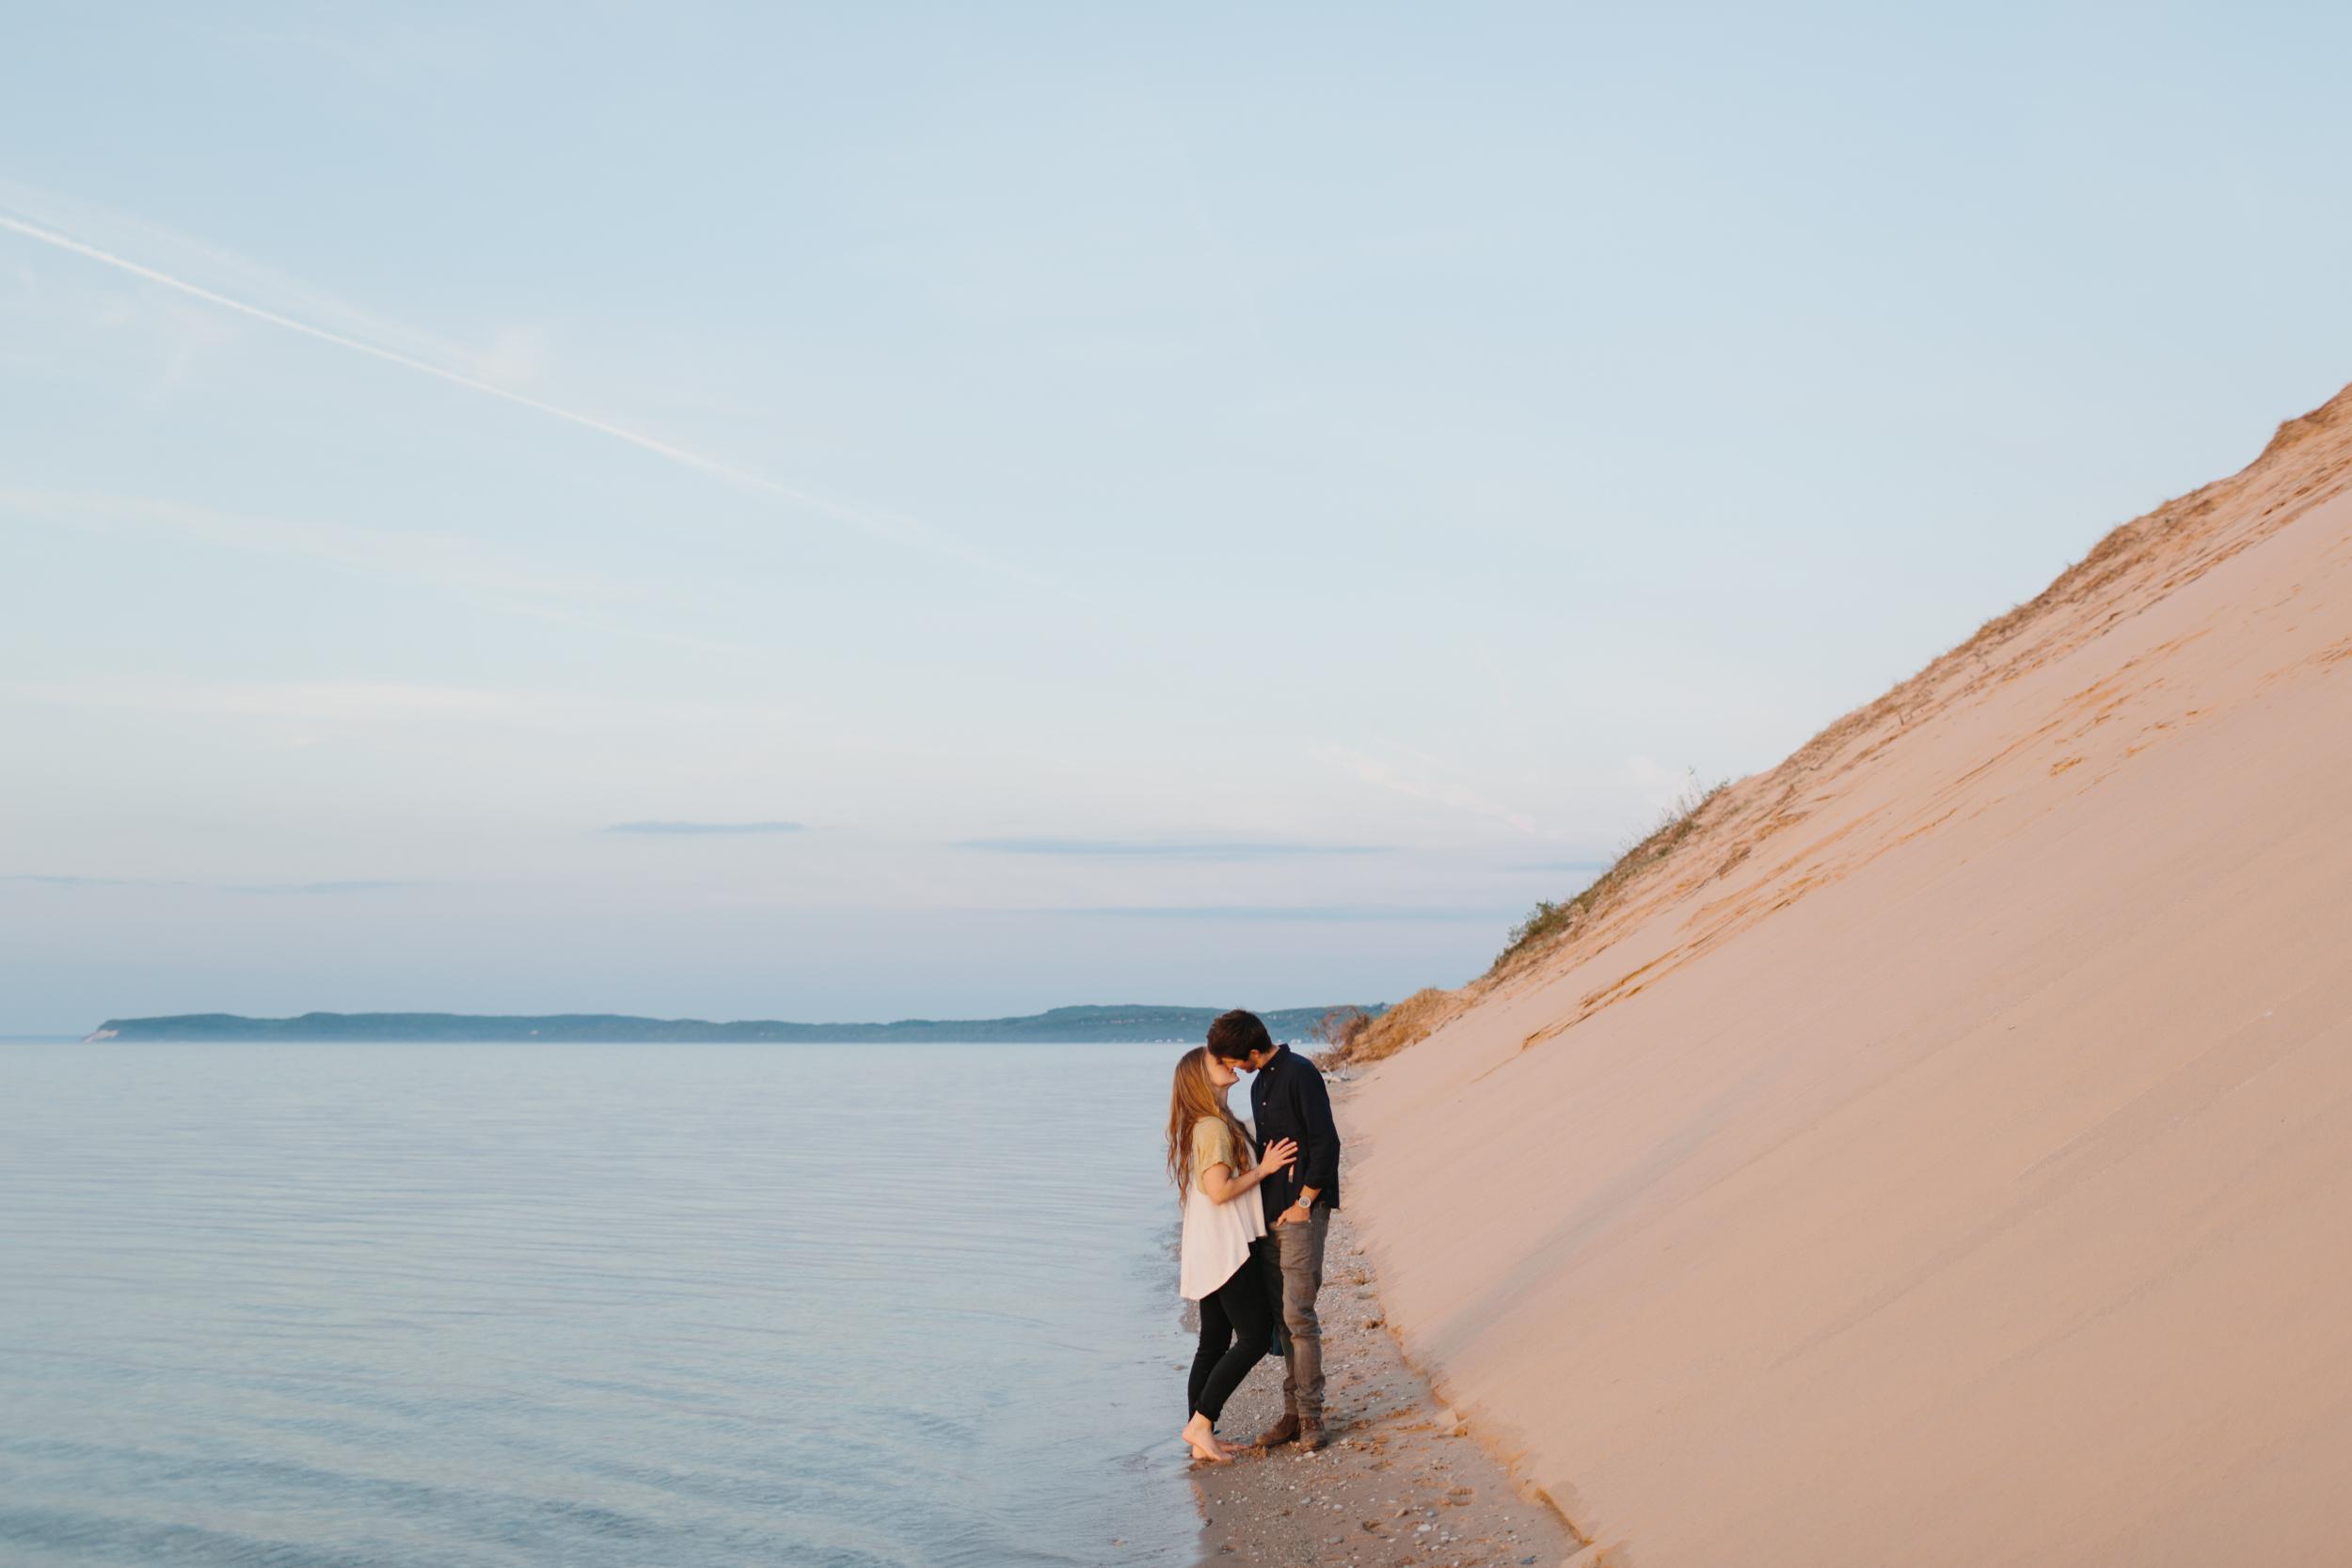 Northern Michigan Lake Michigan Wedding and Portrait Photographer Mae Stier-054.jpg